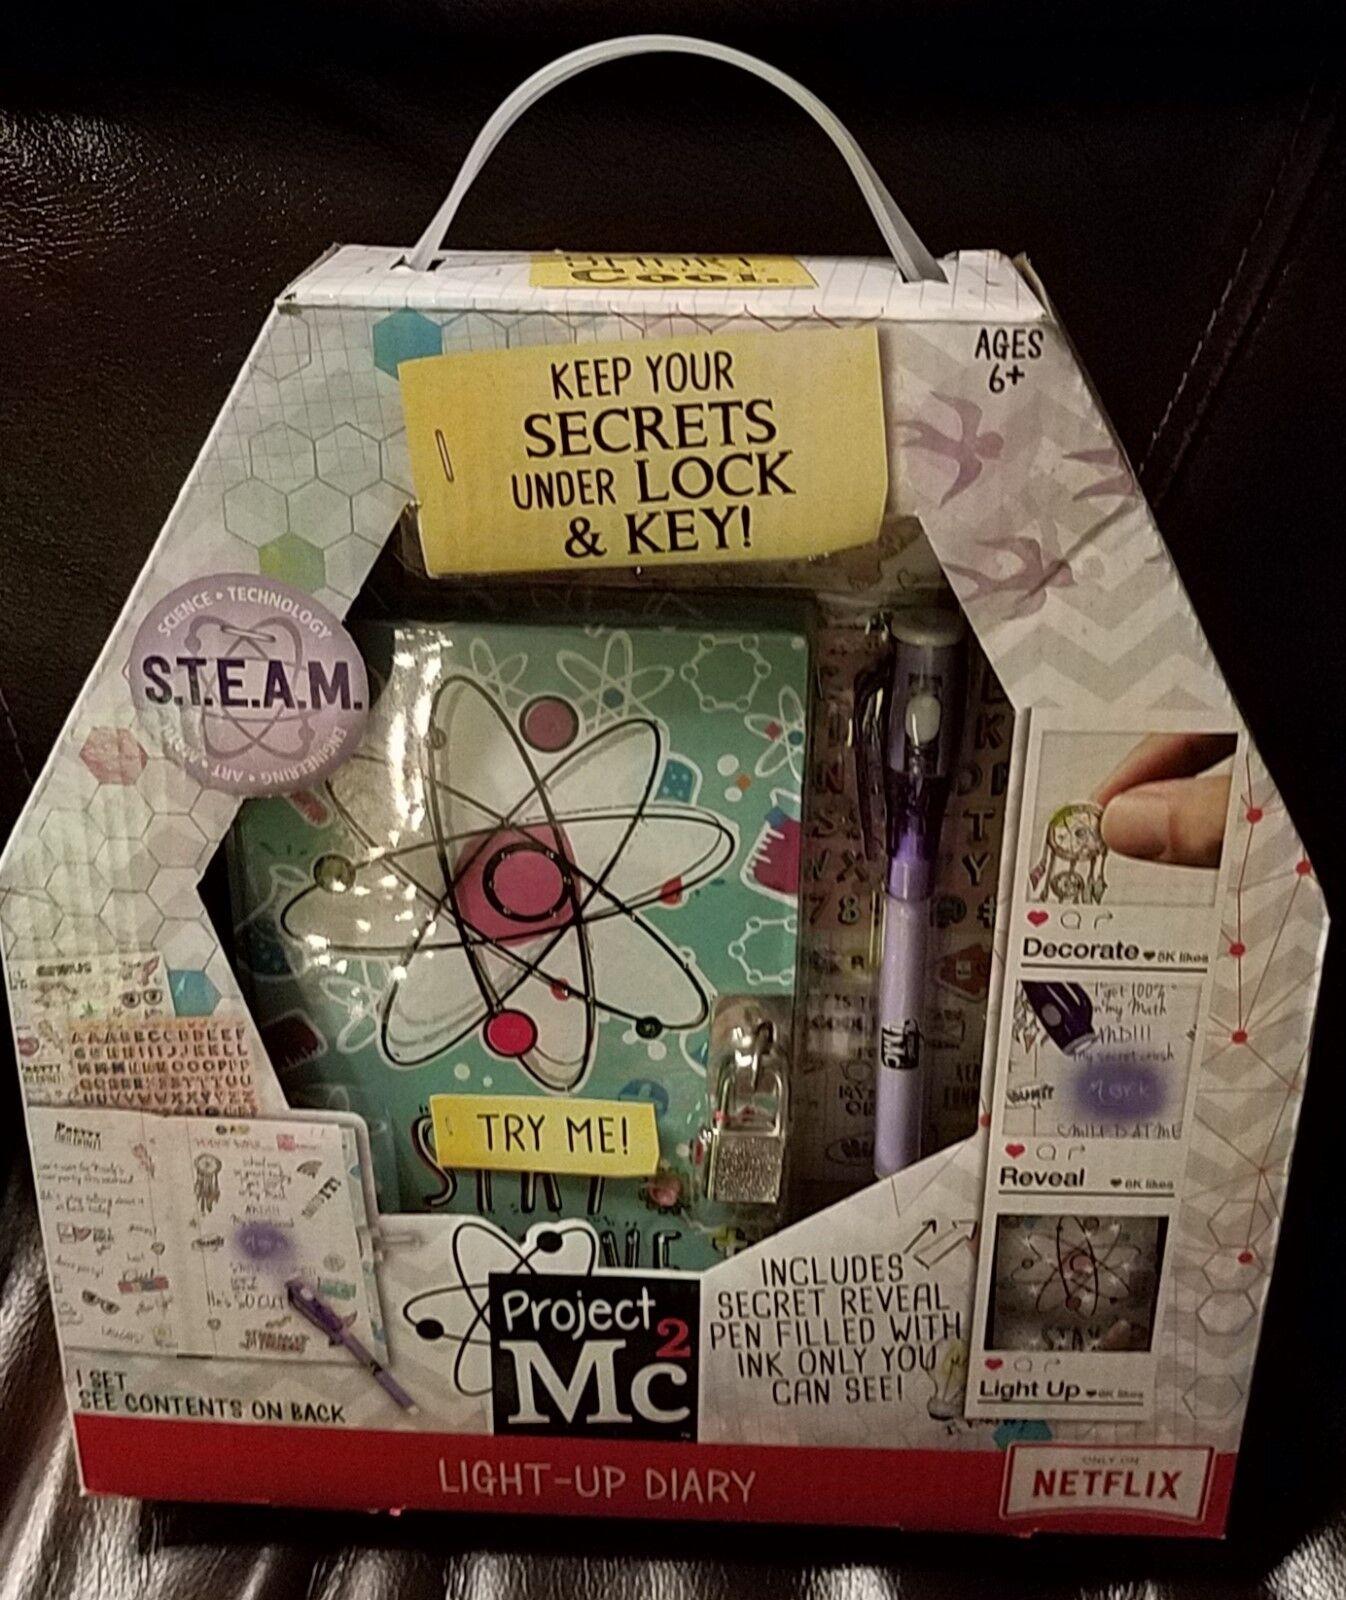 S.T.E.A.M 2X Project MC2 Light Up Diary /& Secret Invisible Ink NIB On Netflix